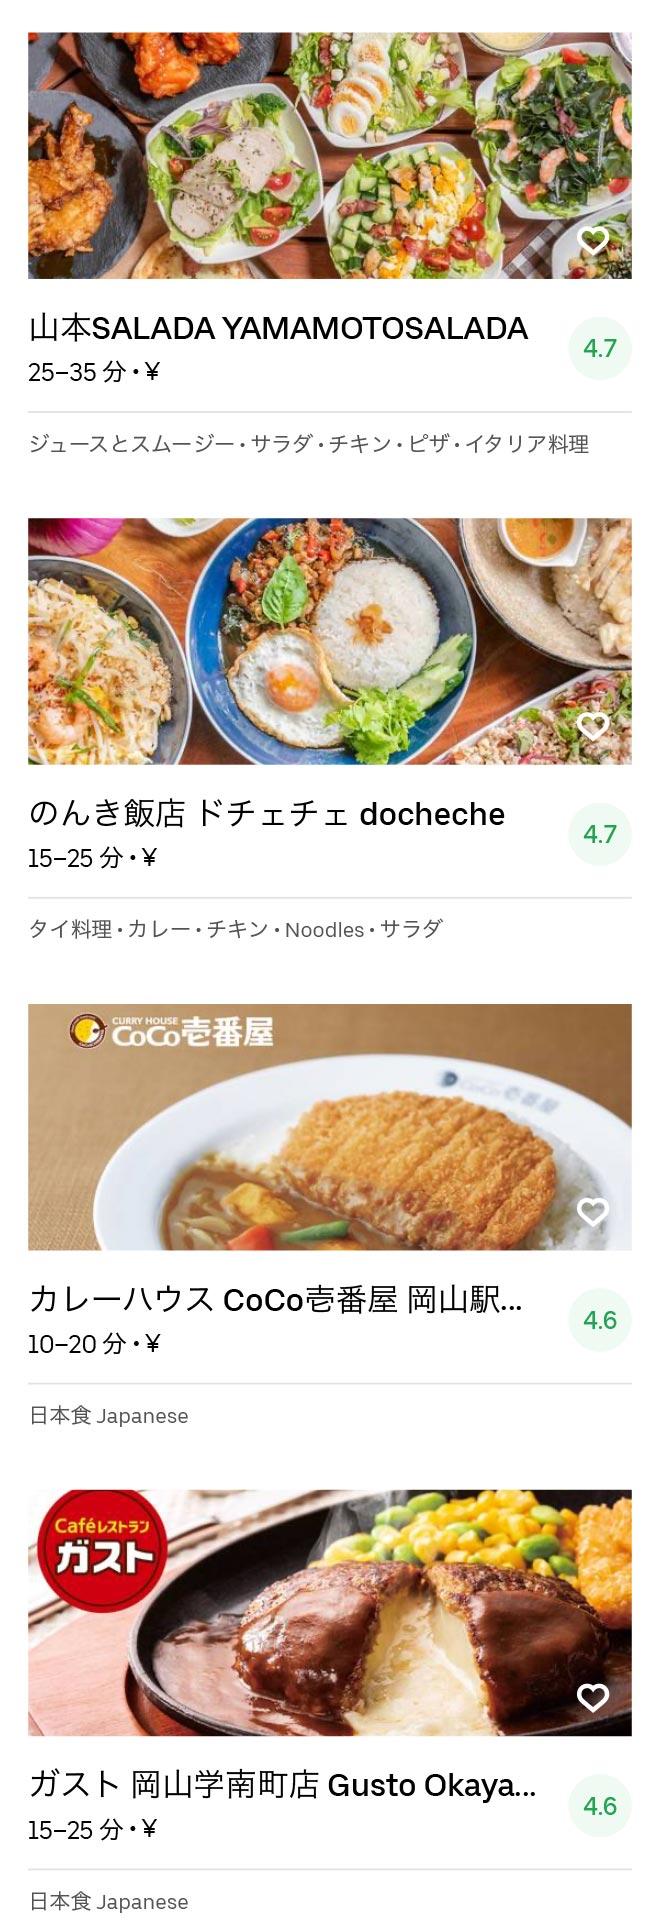 Okayama menu 2007 05